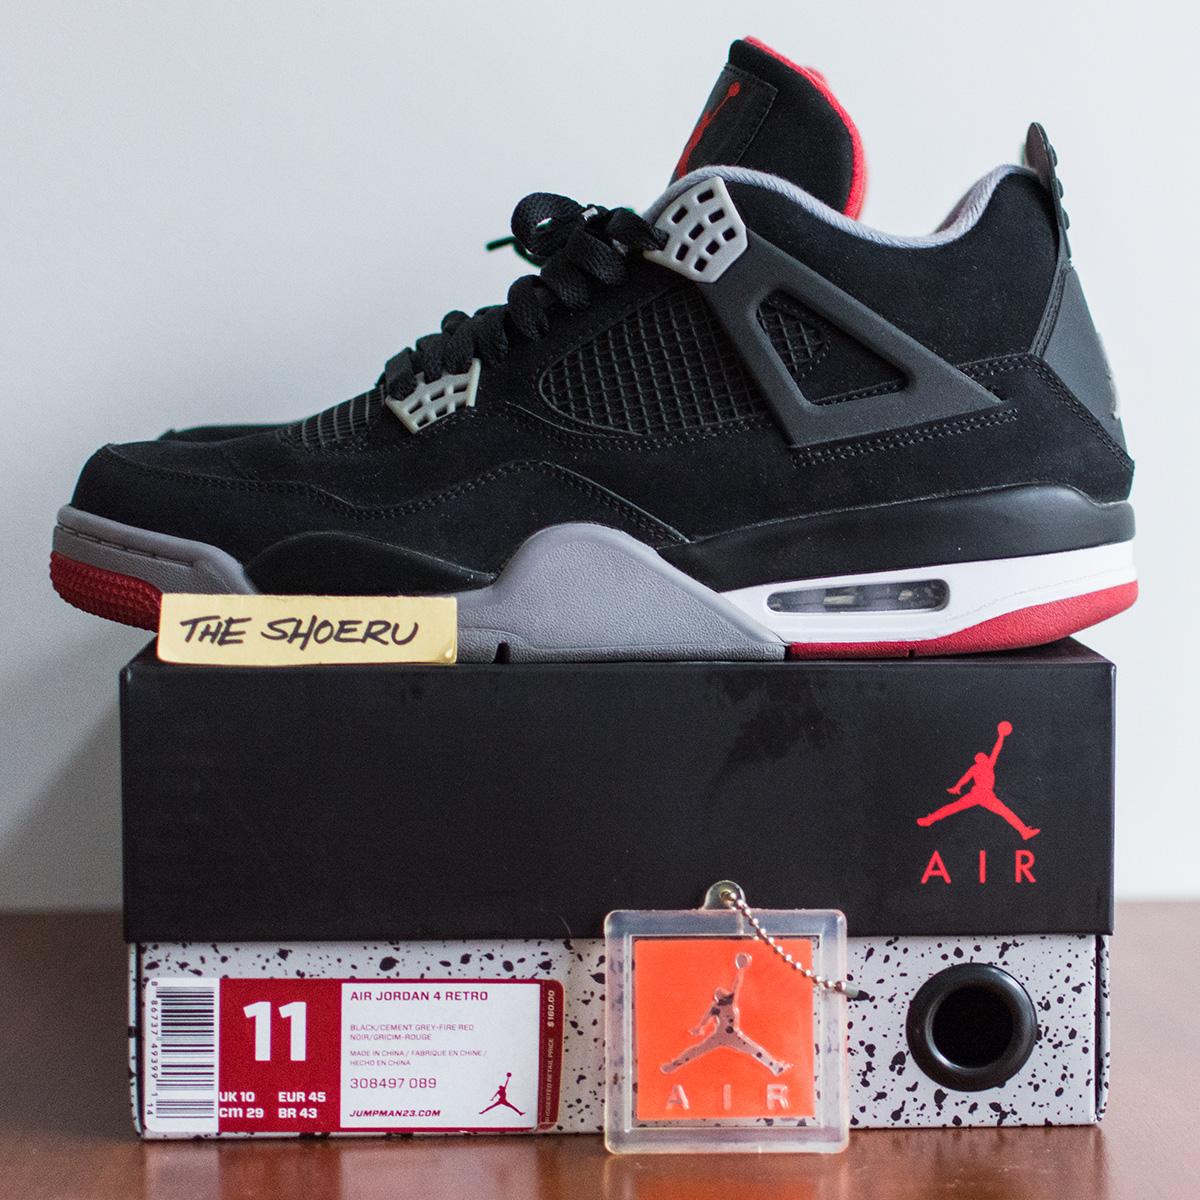 0c60ccf0 Nike Air Jordan 4 Retro Bred (black/cement Grey) 2012   Grailed